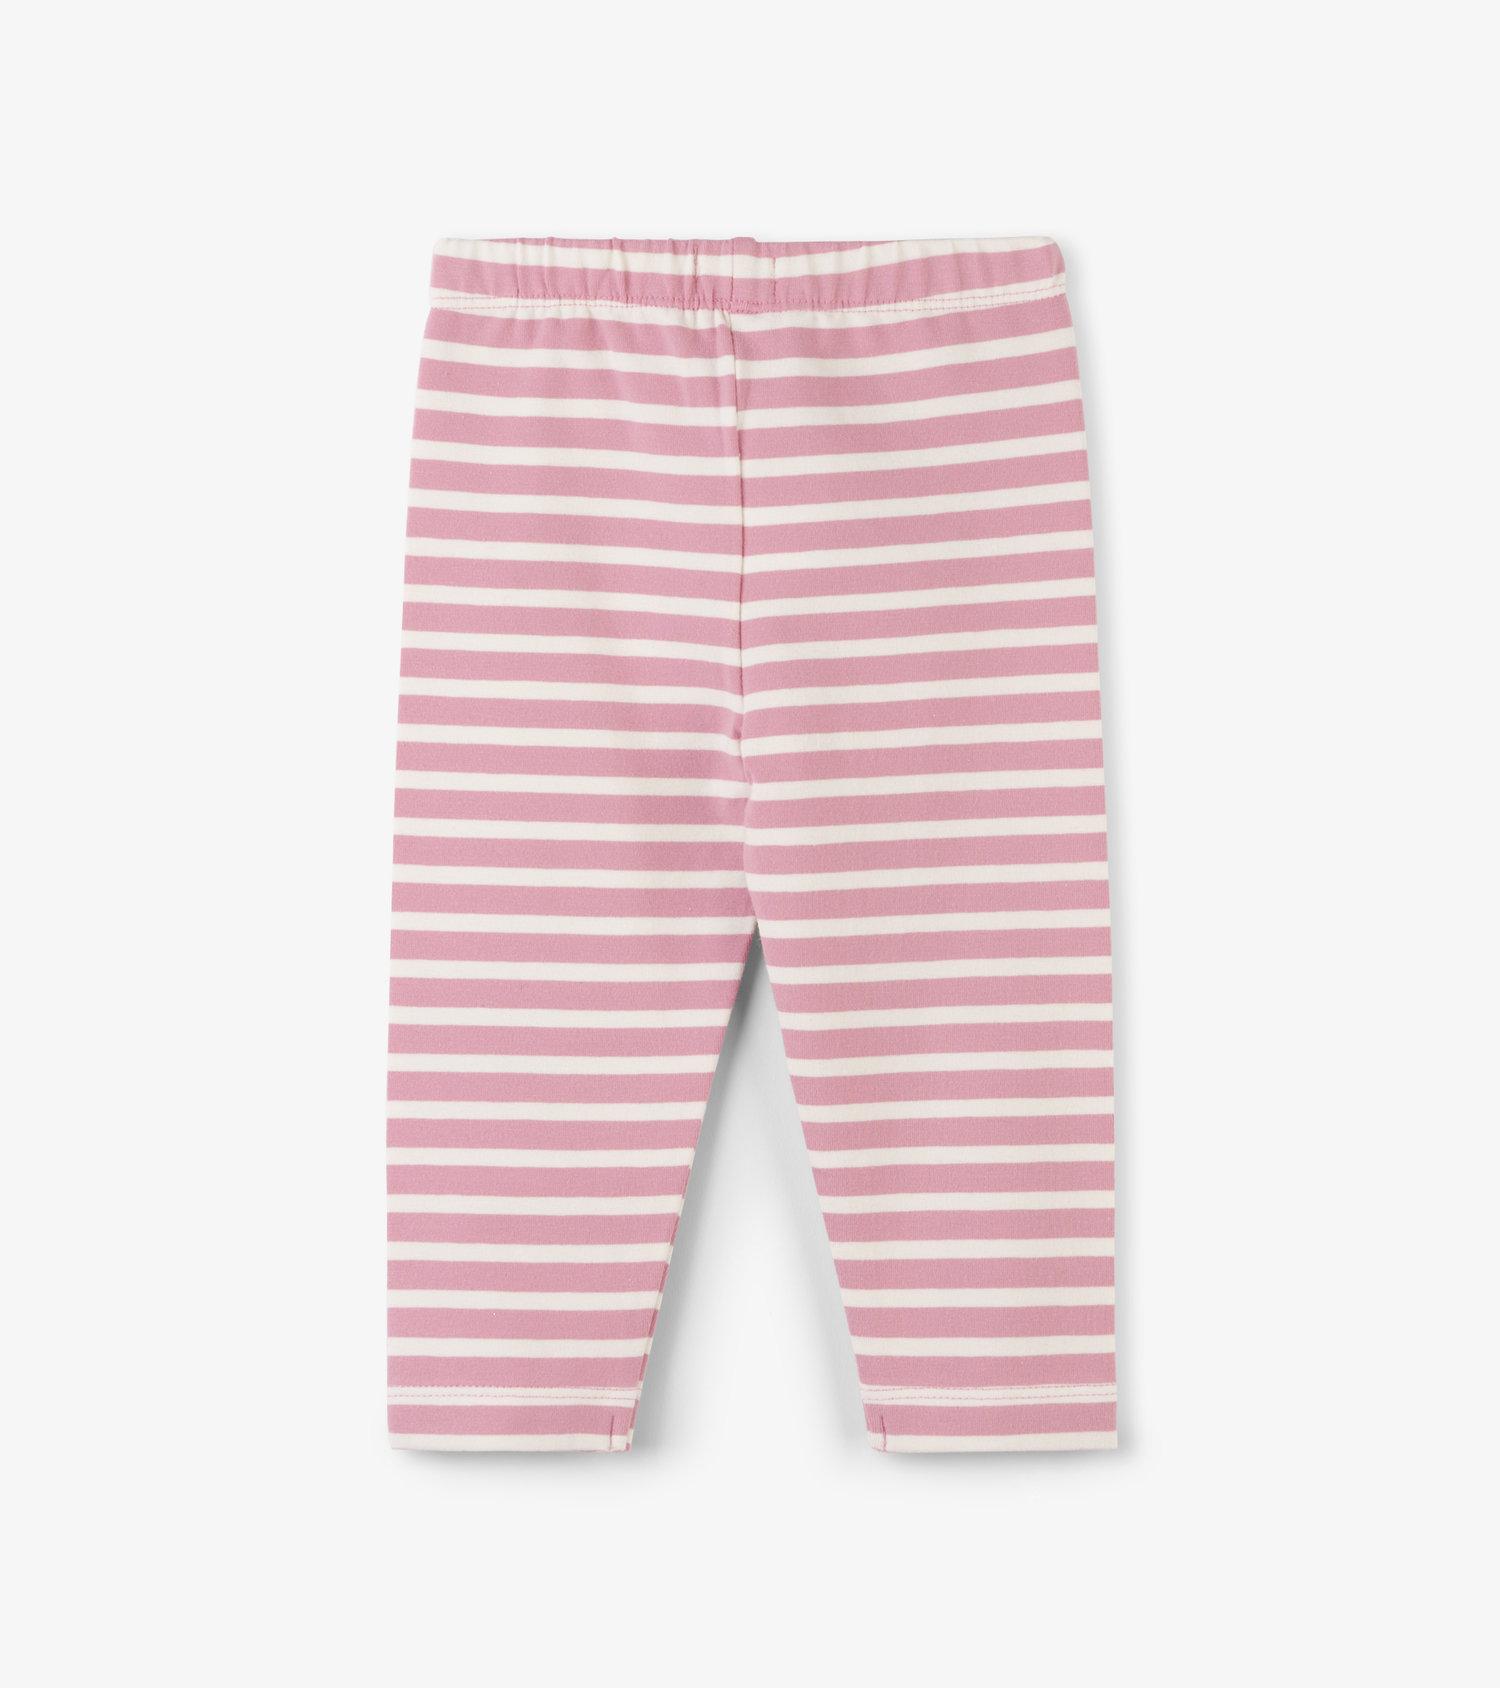 fb9819a5505f1 Hatley Light Pink Stripe Baby Leggings — Little Angel Boutiques